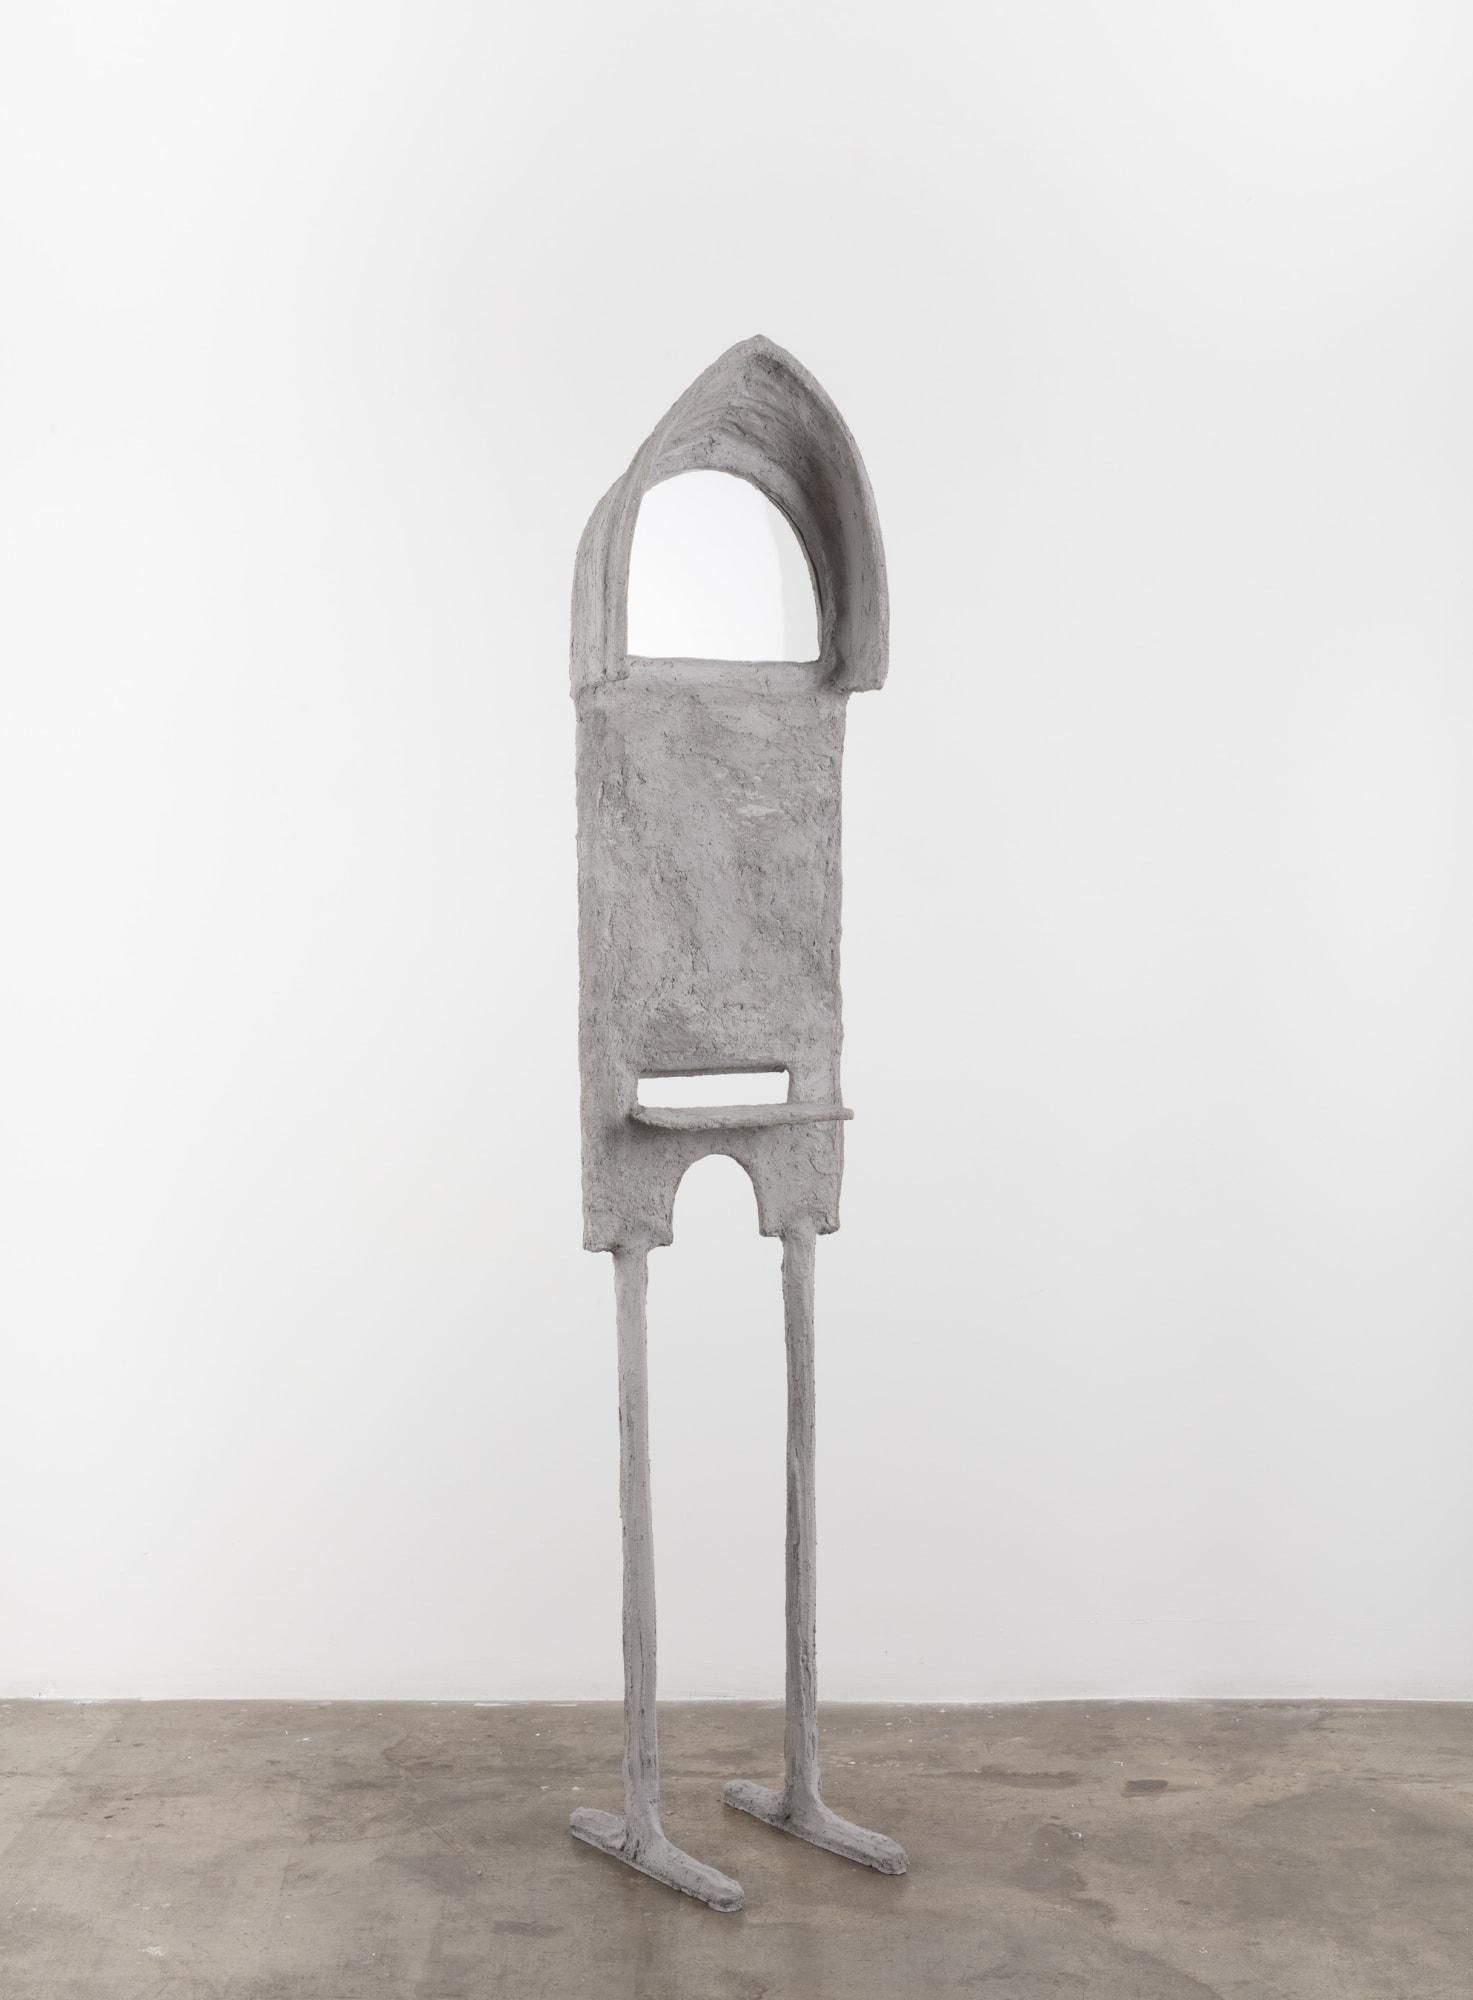 Oren Pinhassi, Untitled (Figure no. 3), 2020